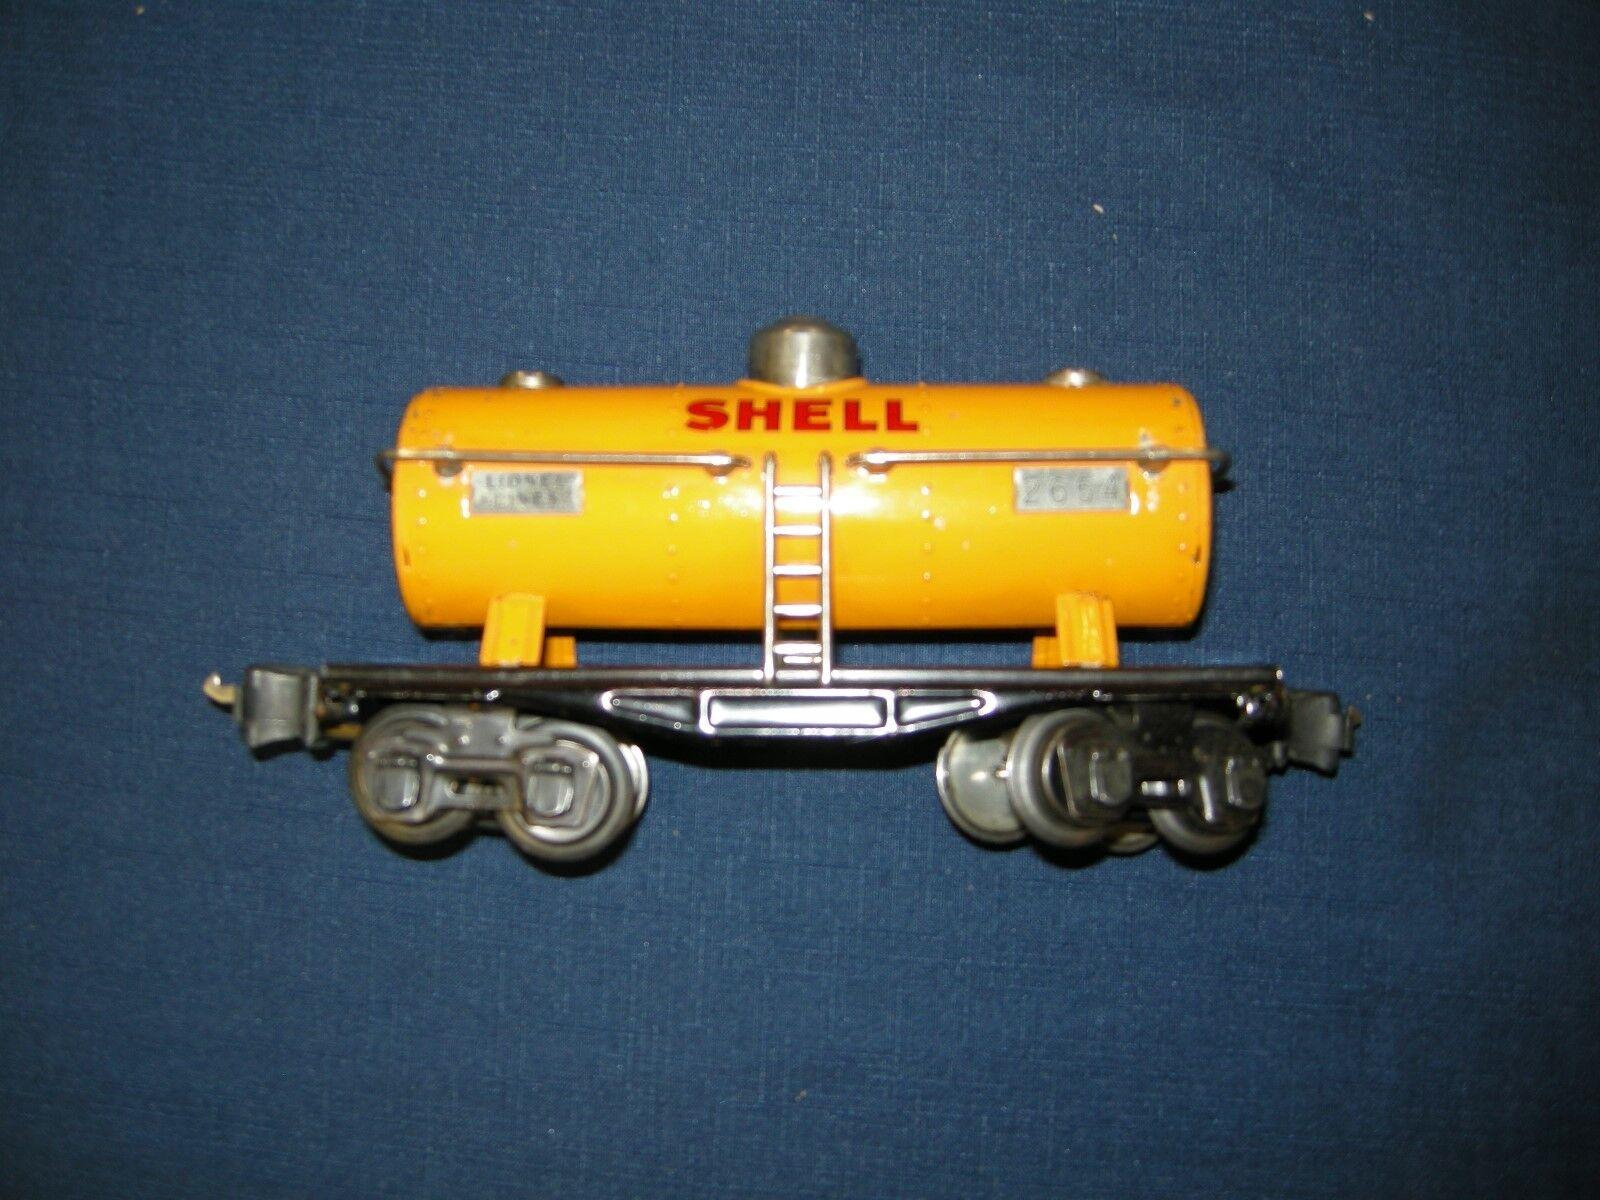 LIONEL 2654 TANK CAR PRE WAR YELLOW SHELL OIL LN C8 BEAUTIFUL